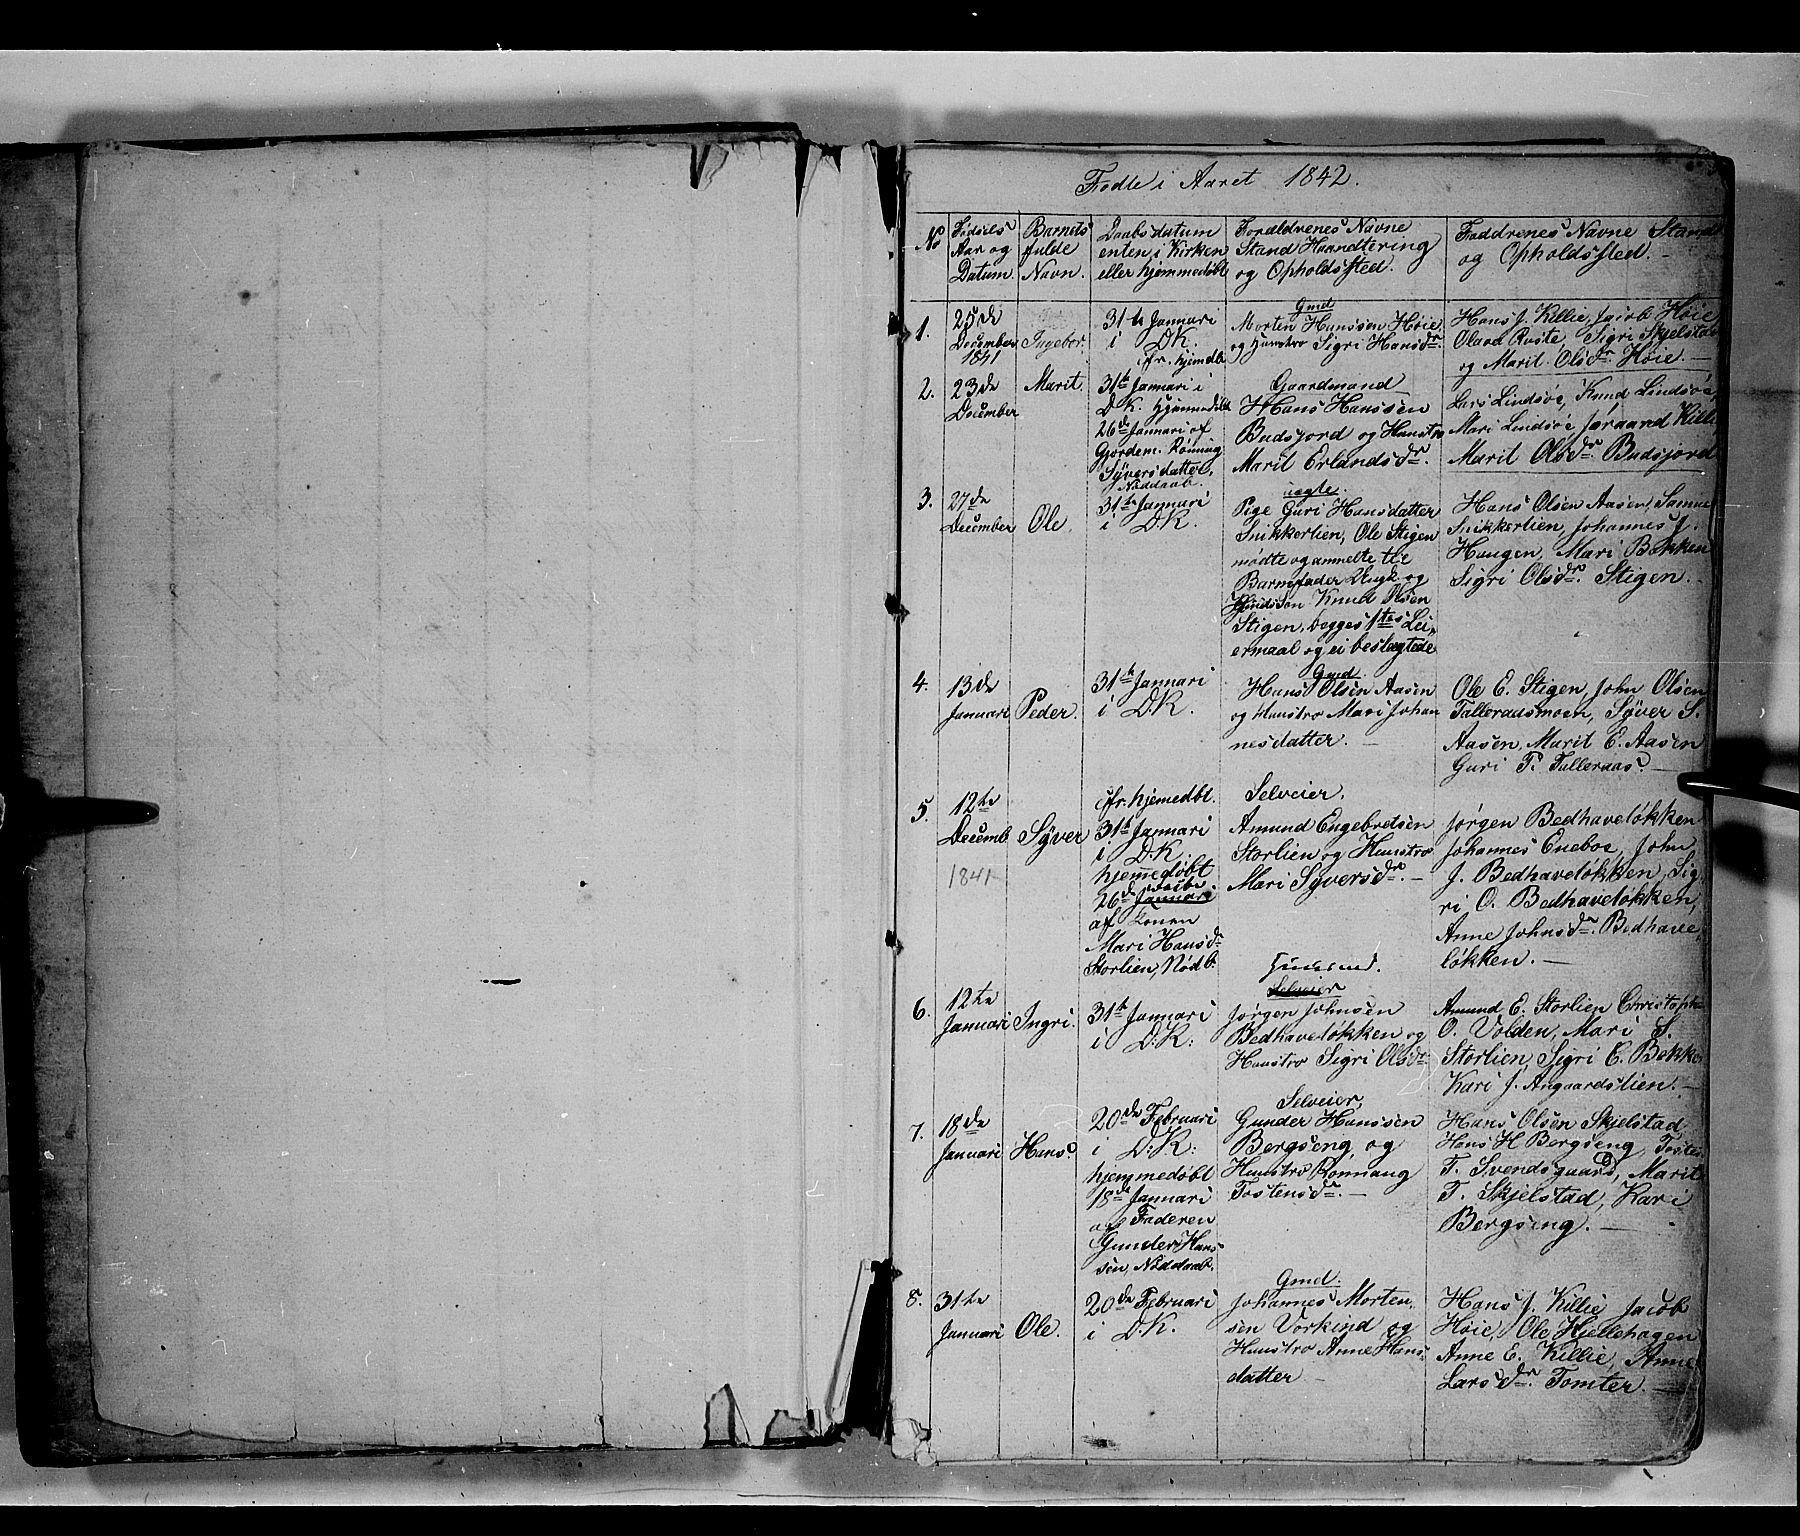 SAH, Lesja prestekontor, Klokkerbok nr. 3, 1842-1862, s. 2-3